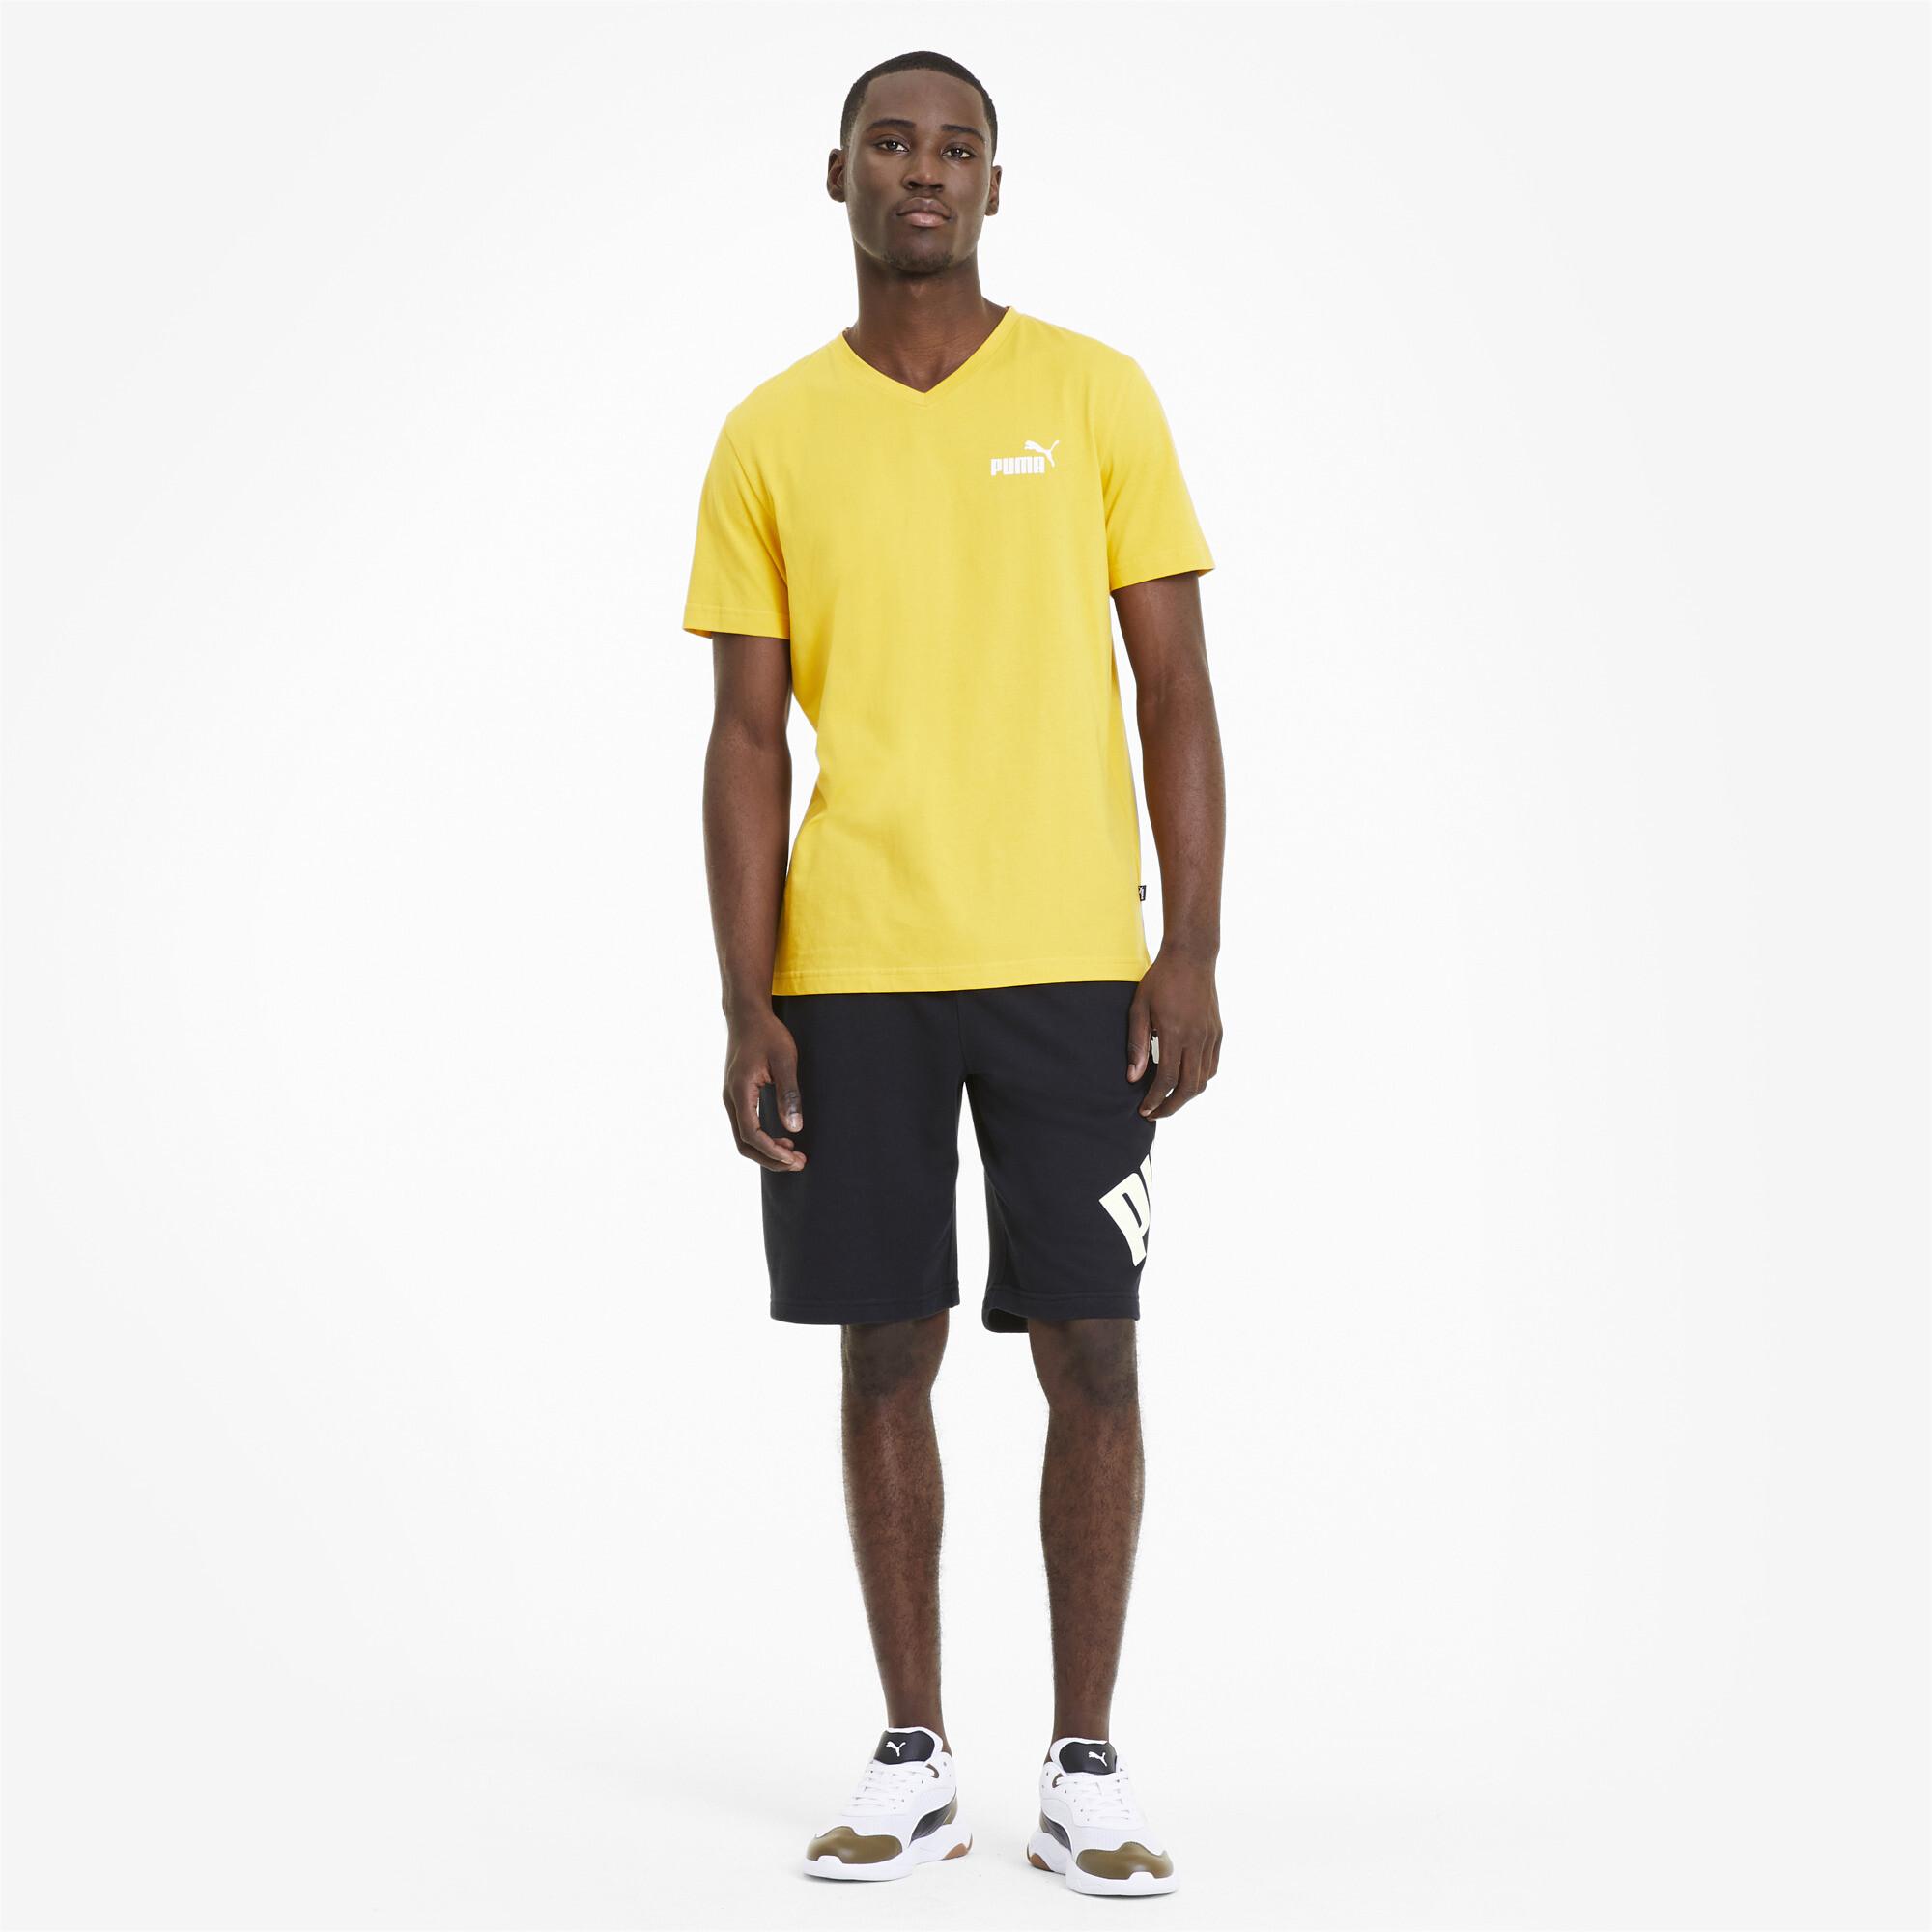 PUMA-Big-Logo-Men-039-s-Shorts-Men-Knitted-Shorts-Basics thumbnail 6